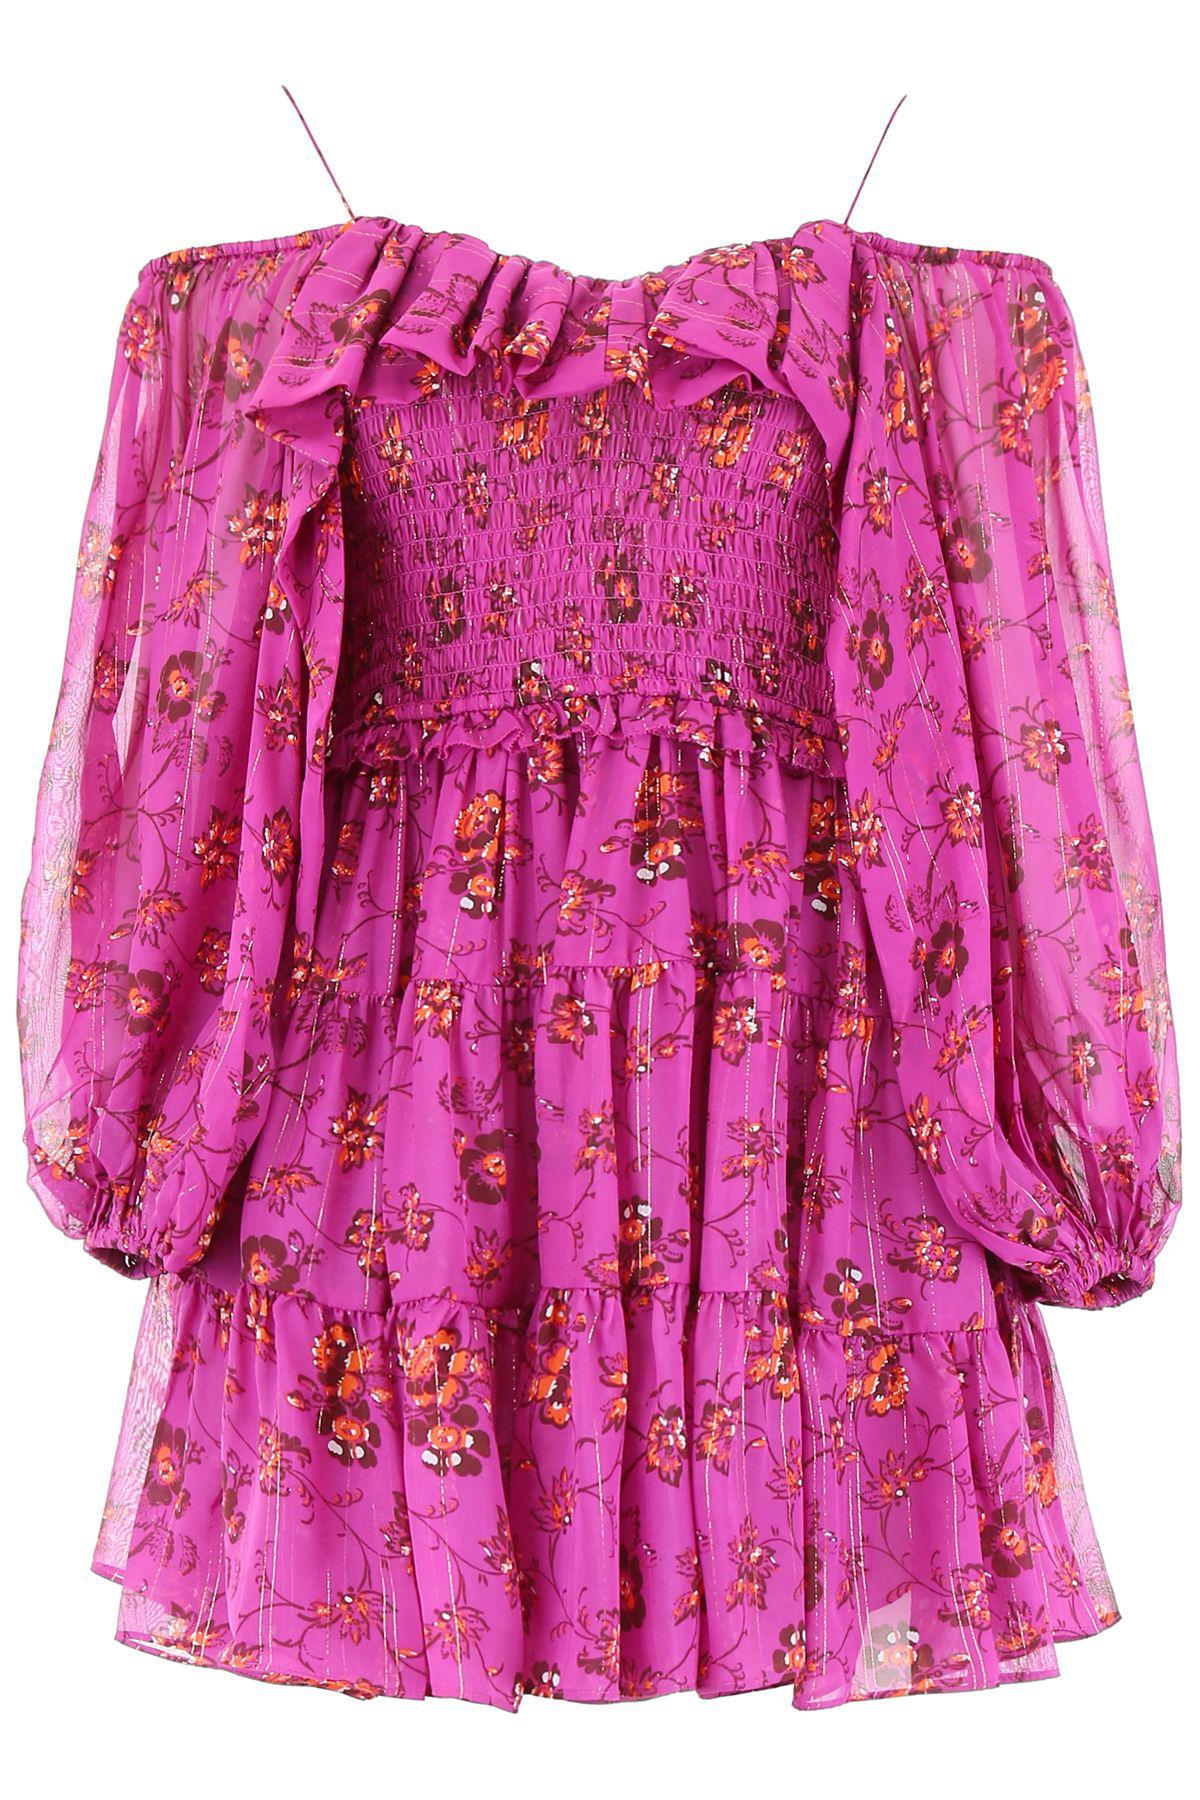 Ulla Johnson Monet Mini Dress In Magenta (Purple)